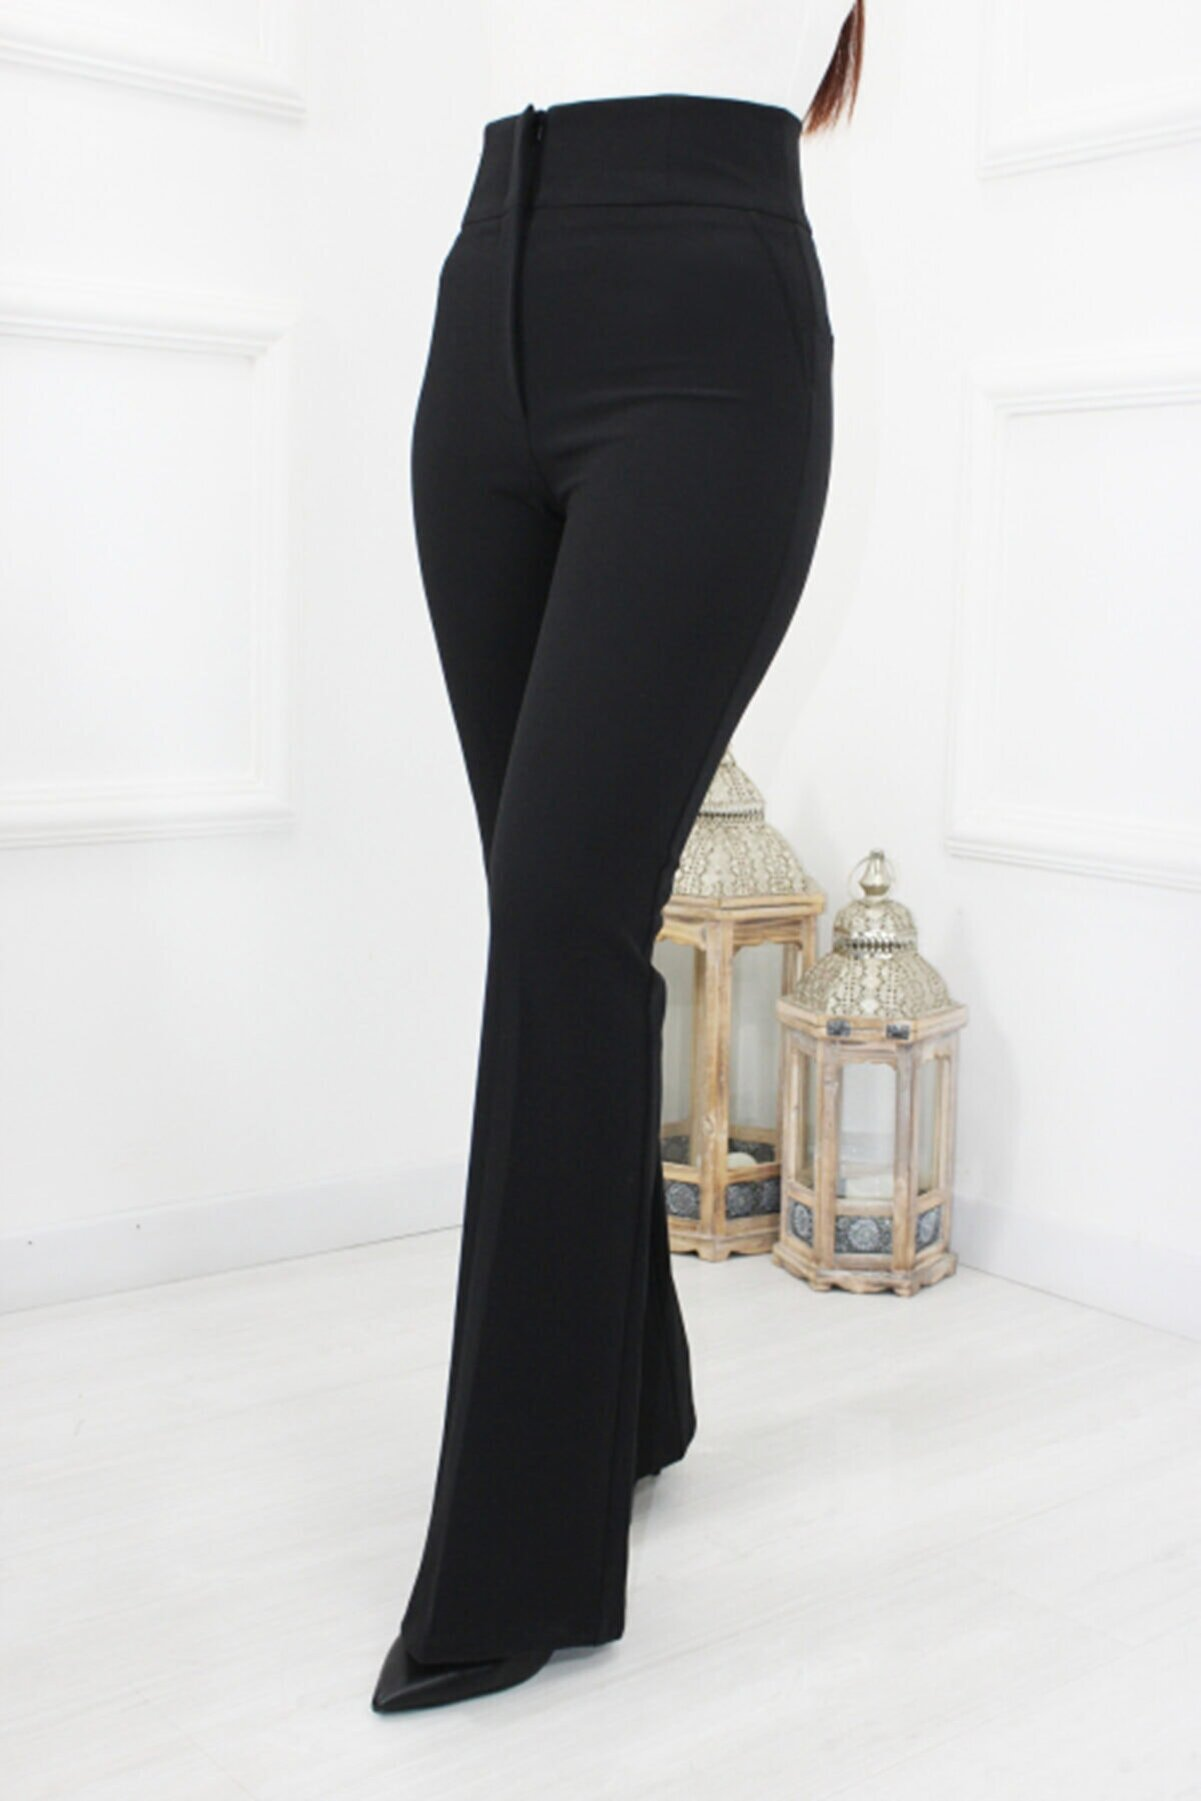 UGİMPOL Yüksek Bel Ispanyol Kumaş Pantolon